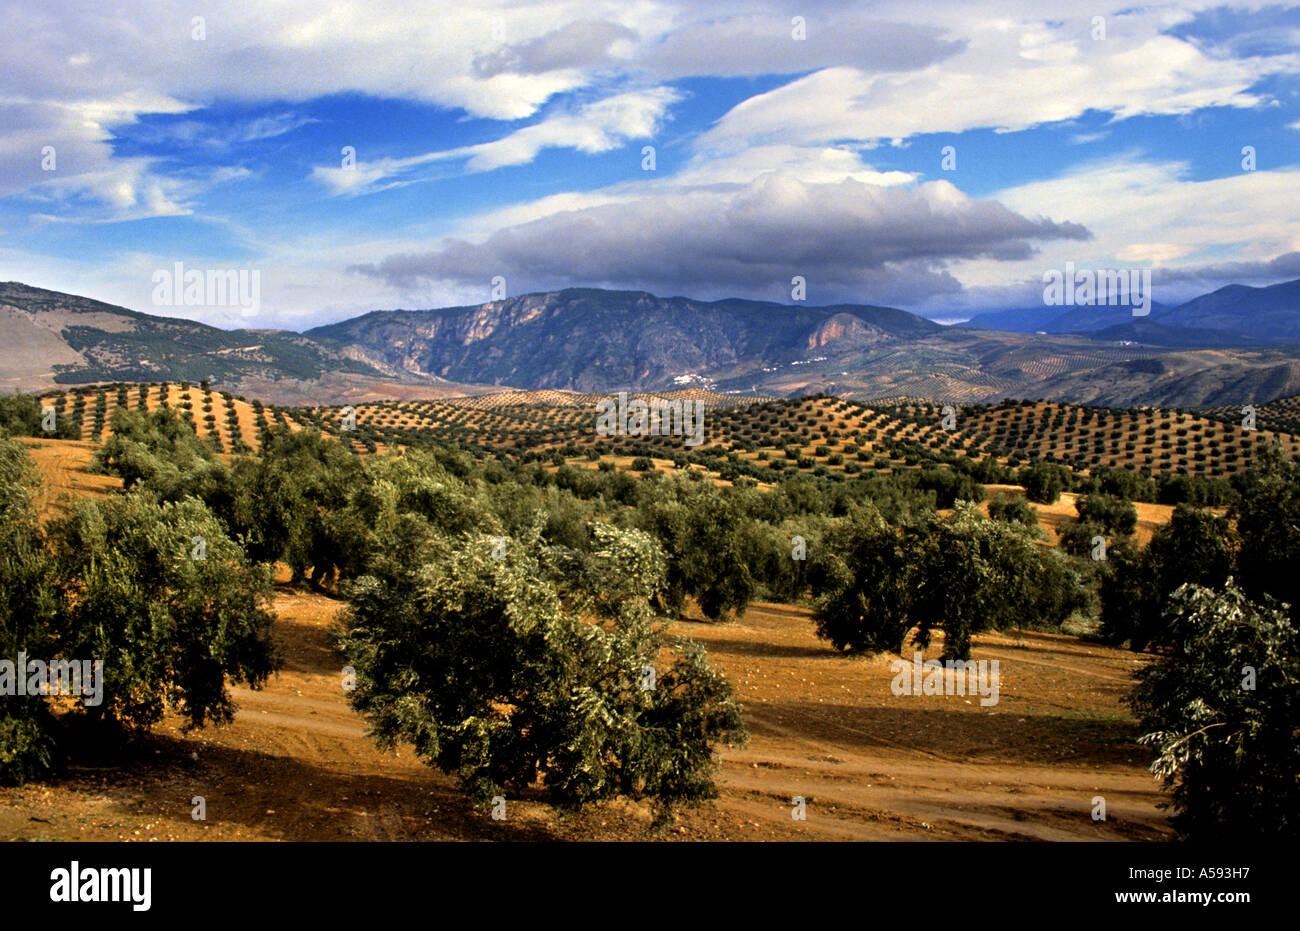 Olive Tree Spain Spanish Landscape Mountains Sun Stock